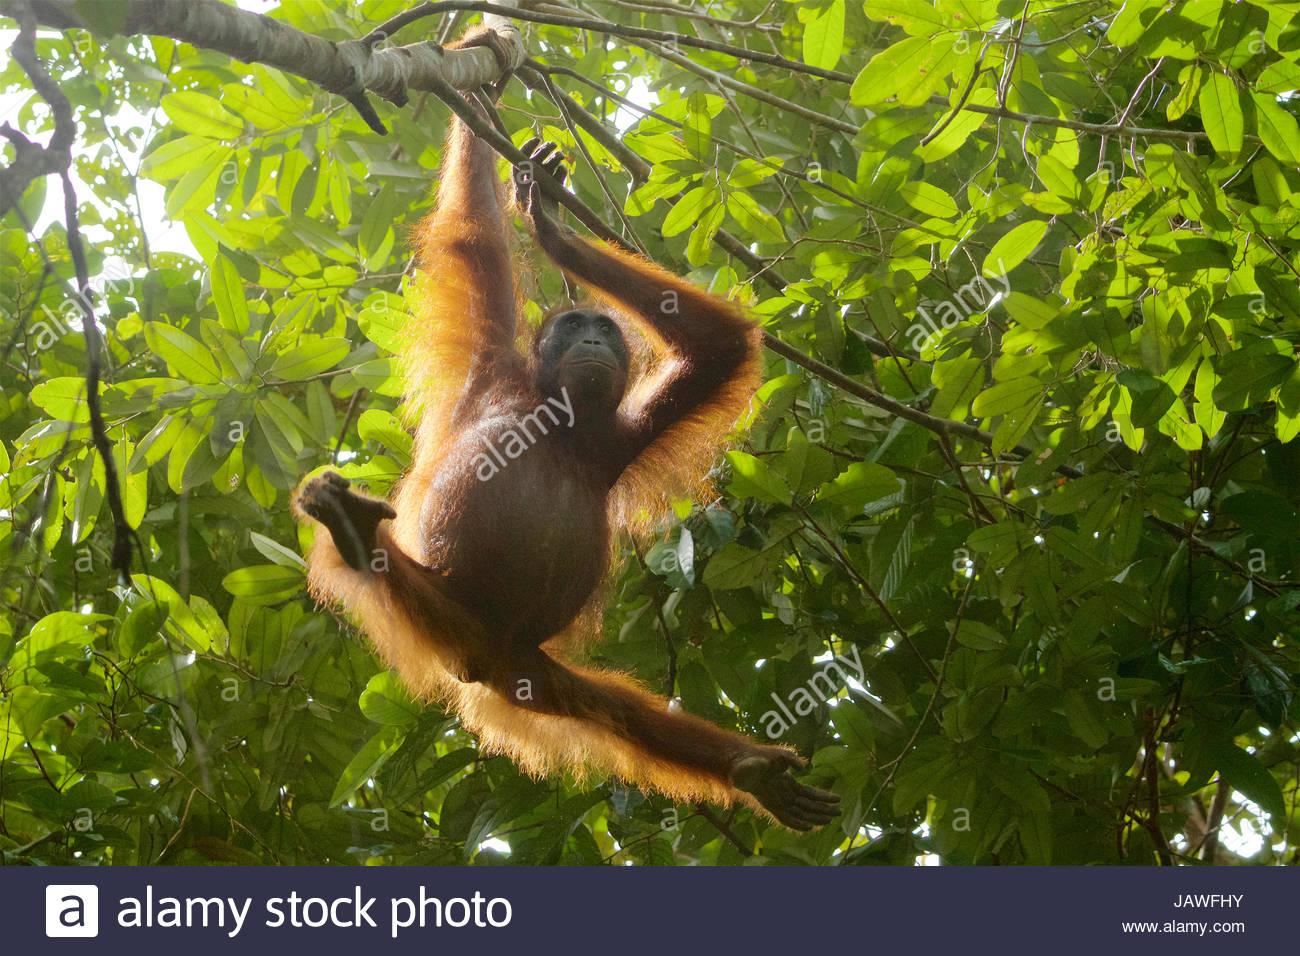 Une femelle adulte orang-outan, Pongo pygmaeus, wurmbii pend d'un arbre à Gunung Palung National Park. Photo Stock